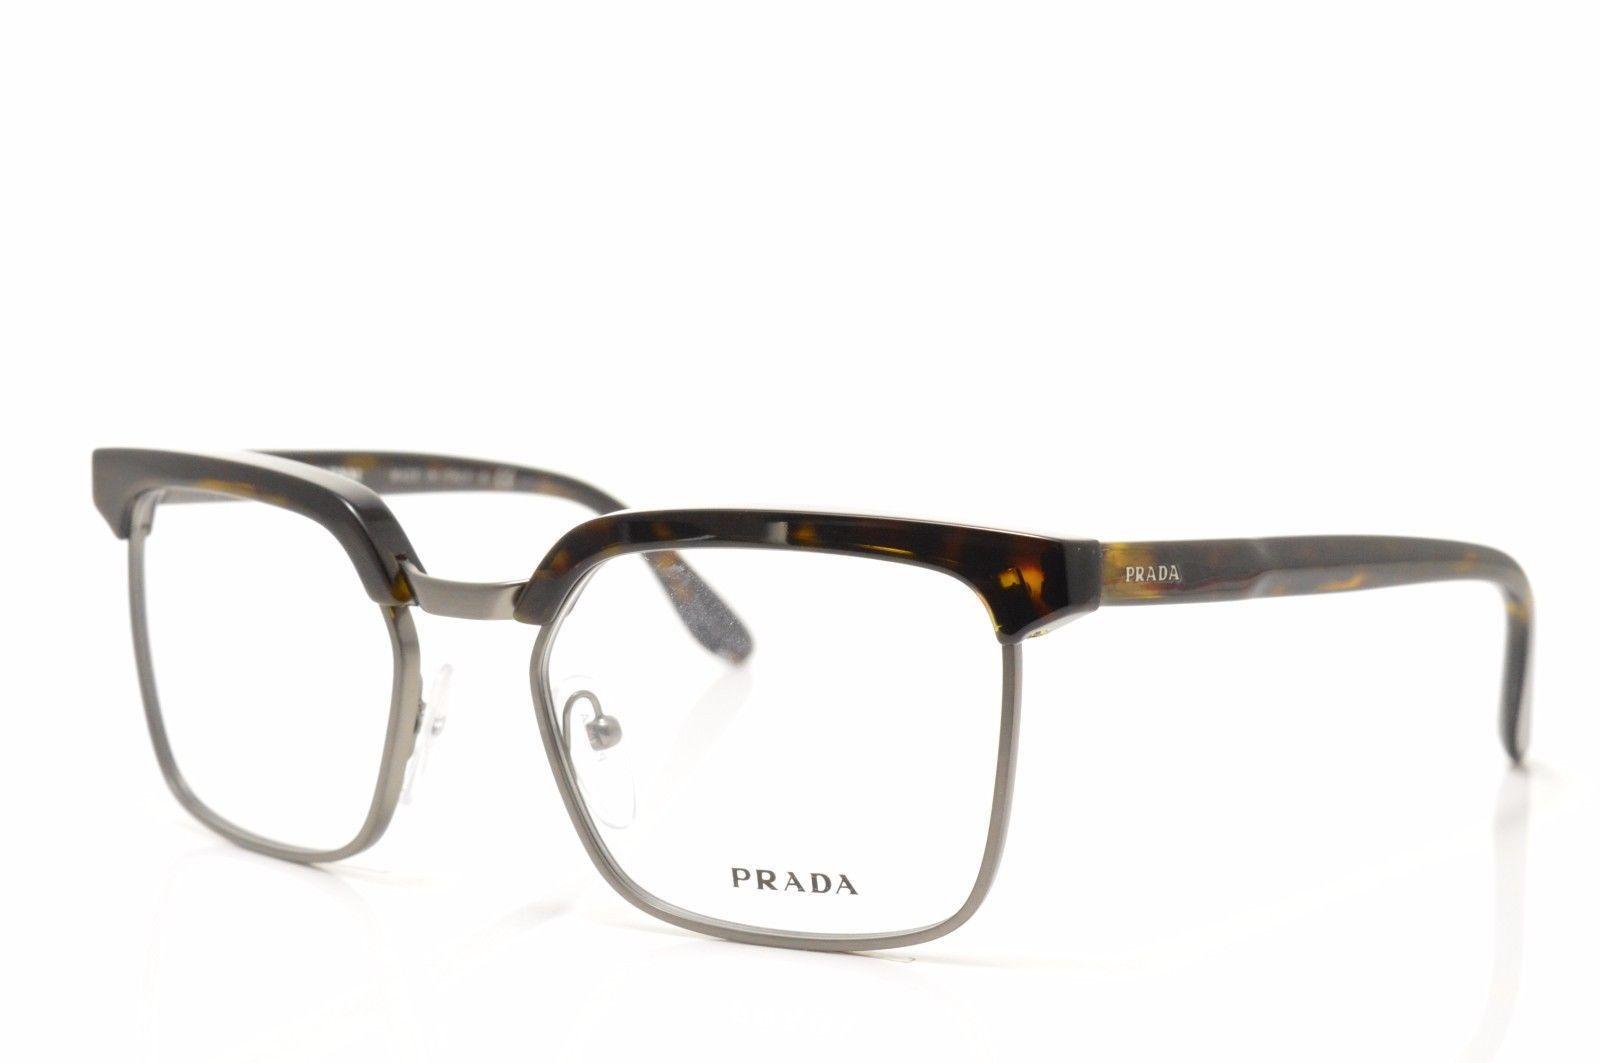 52841b7083fb New PRADA Eyeglasses VPR 15S HAQ-101(Havana) and 50 similar items